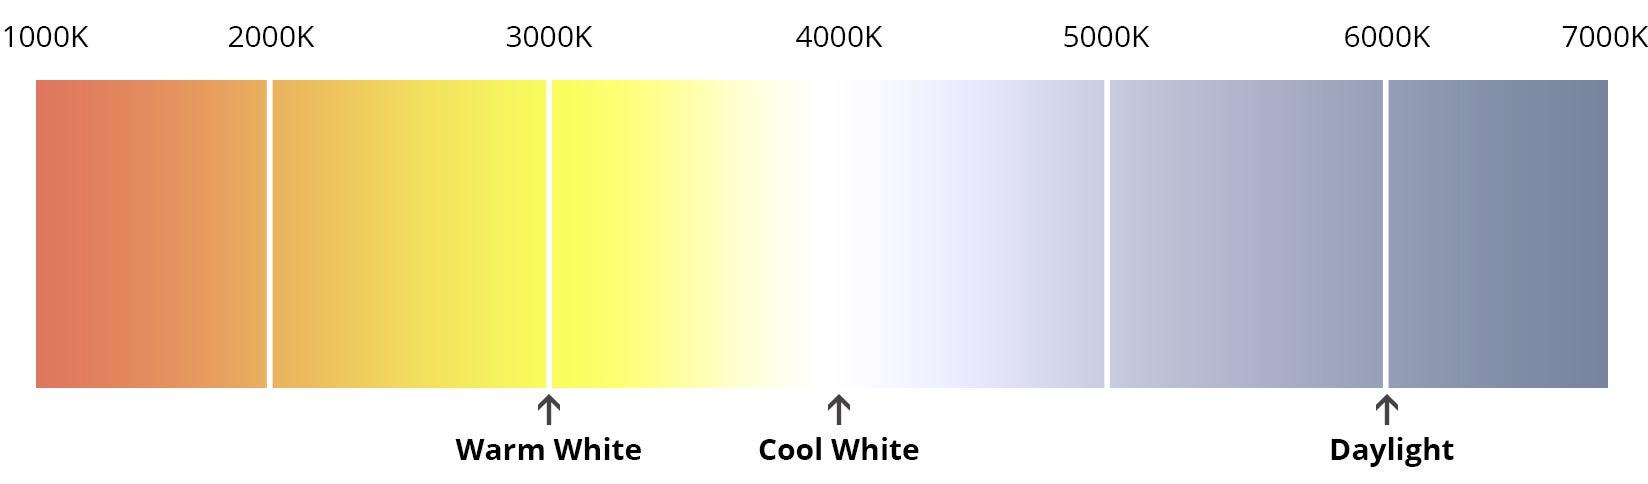 Image segment